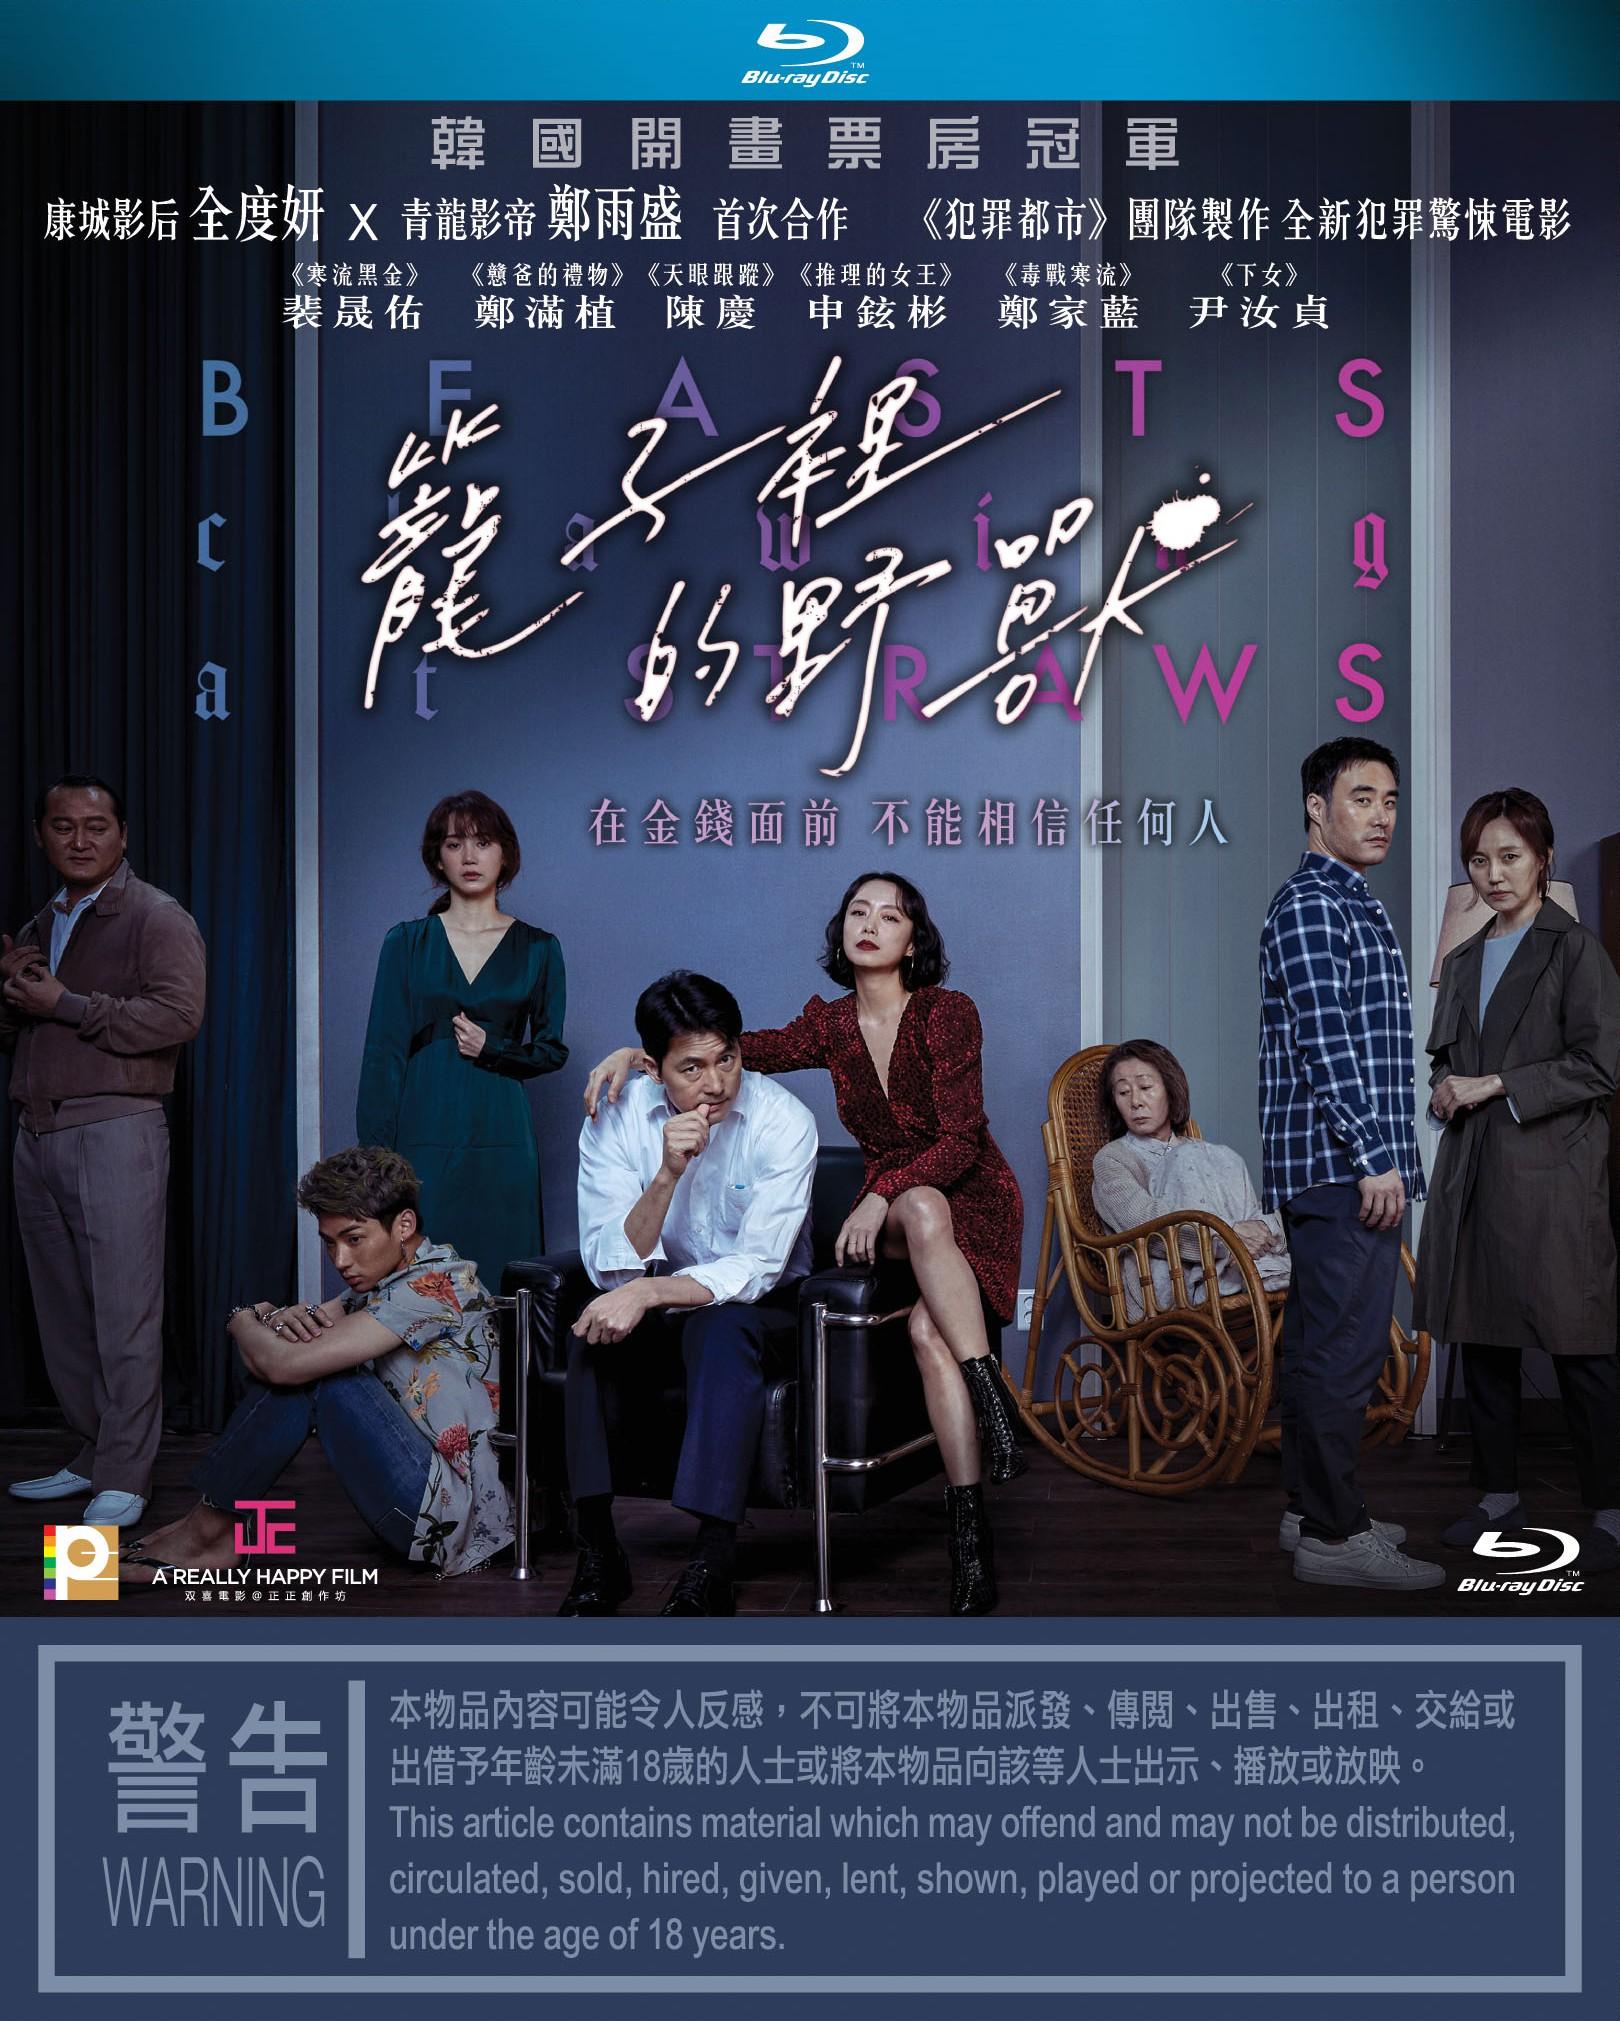 https://shop.panorama.com.hk/hk/drama/3436--.html